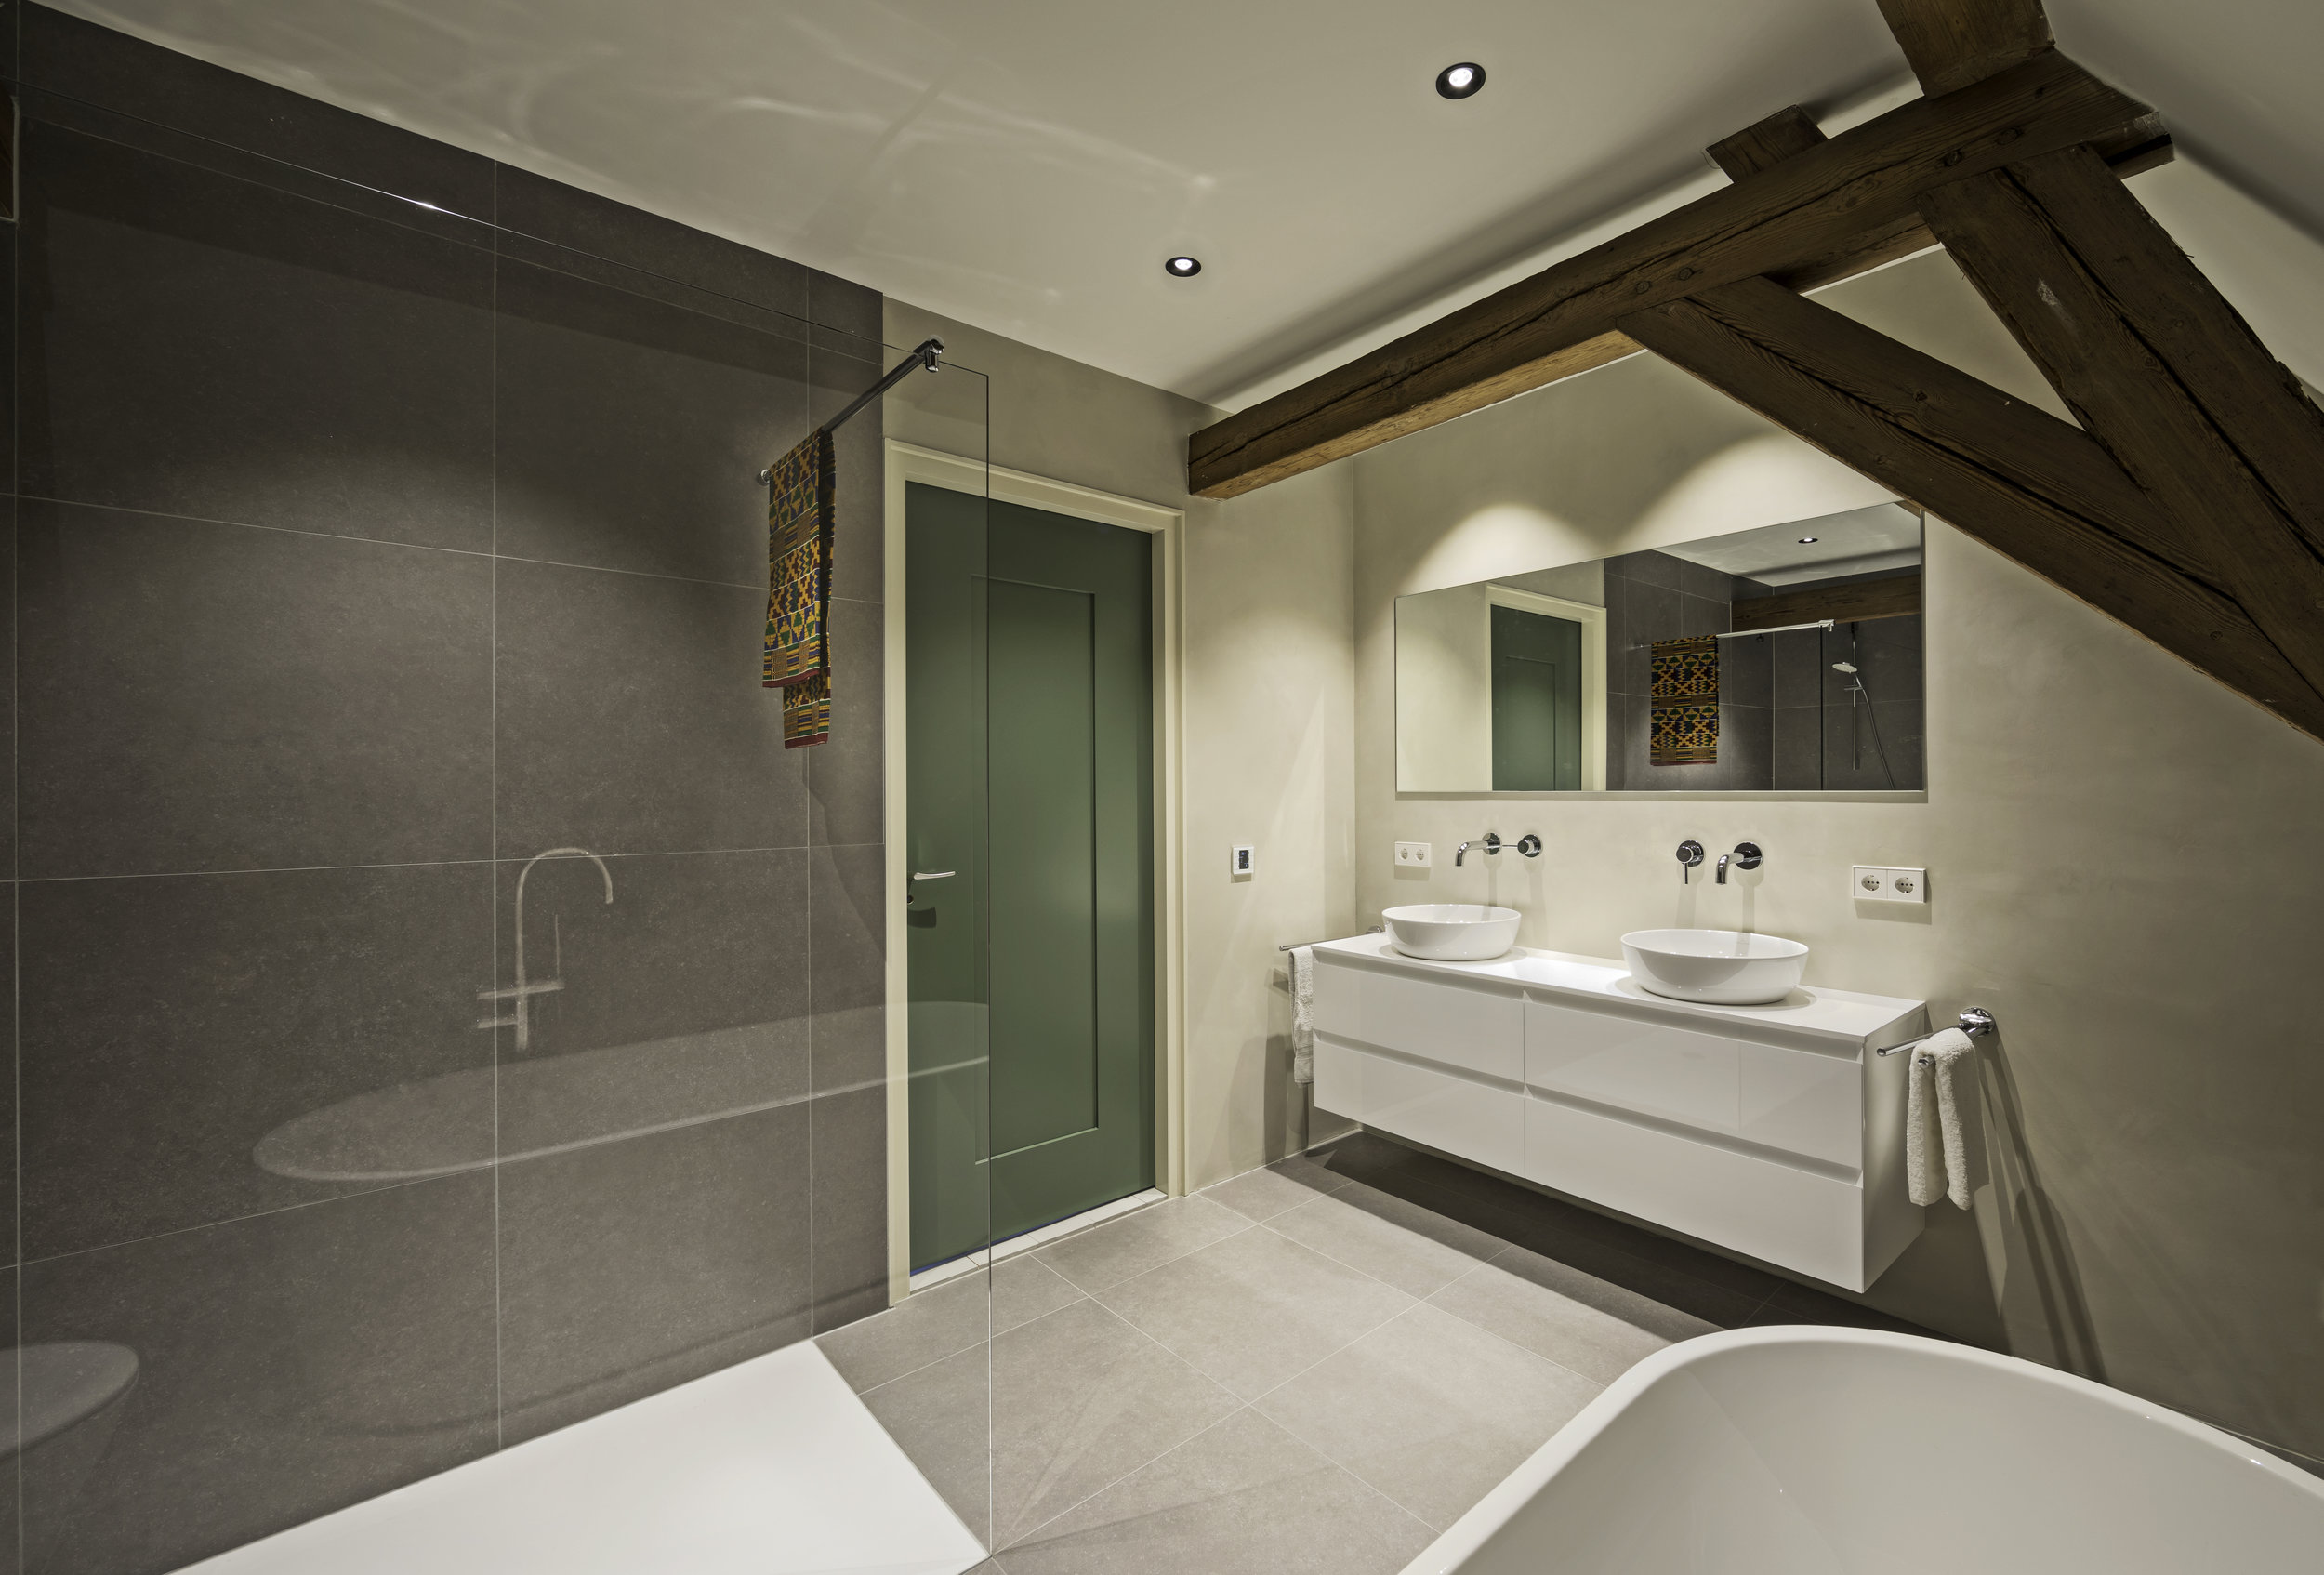 Spant badkamer